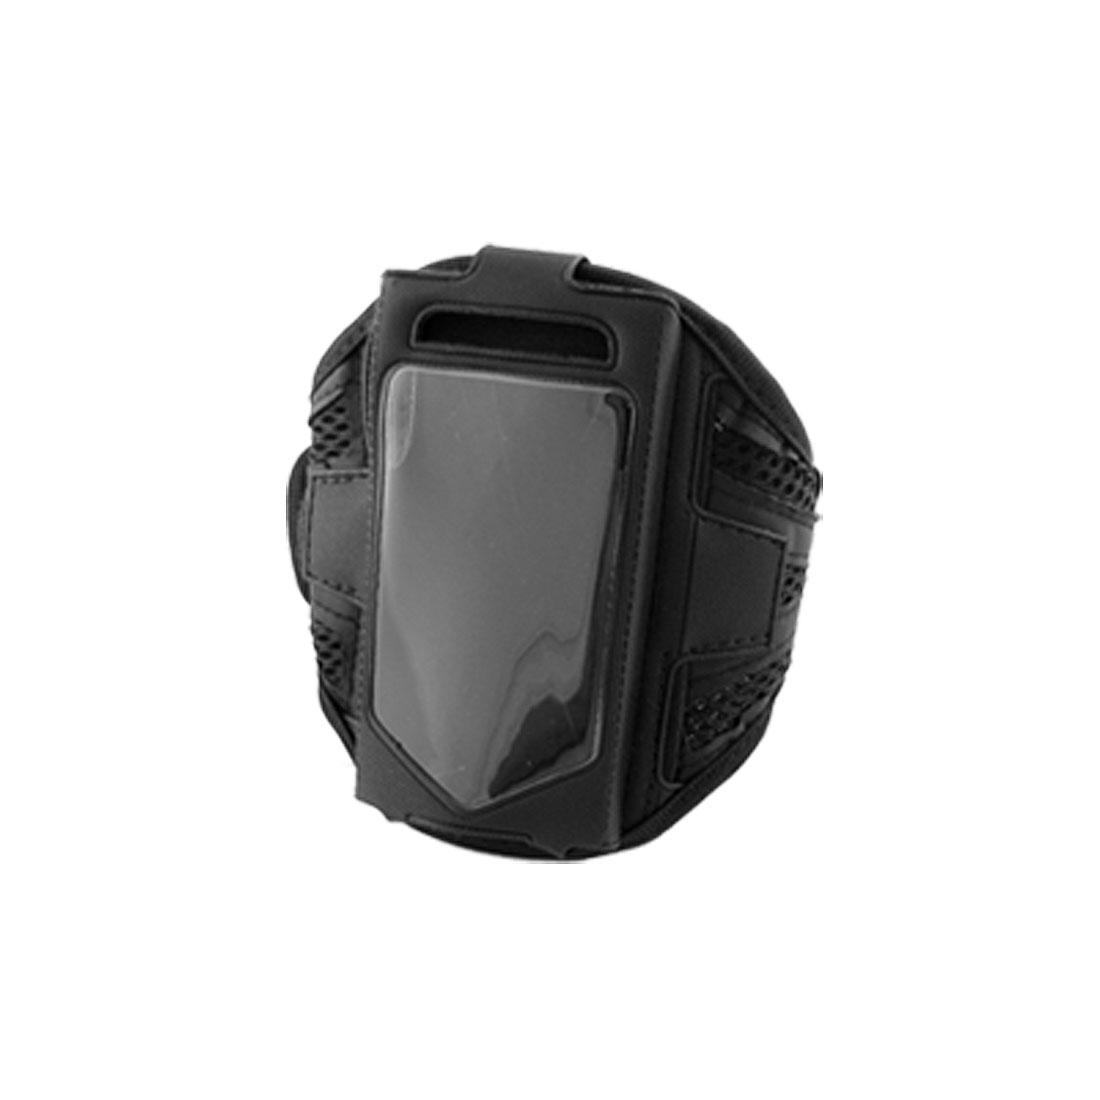 Black Mesh Sports Adjustable Armband Holder for Phone 4G